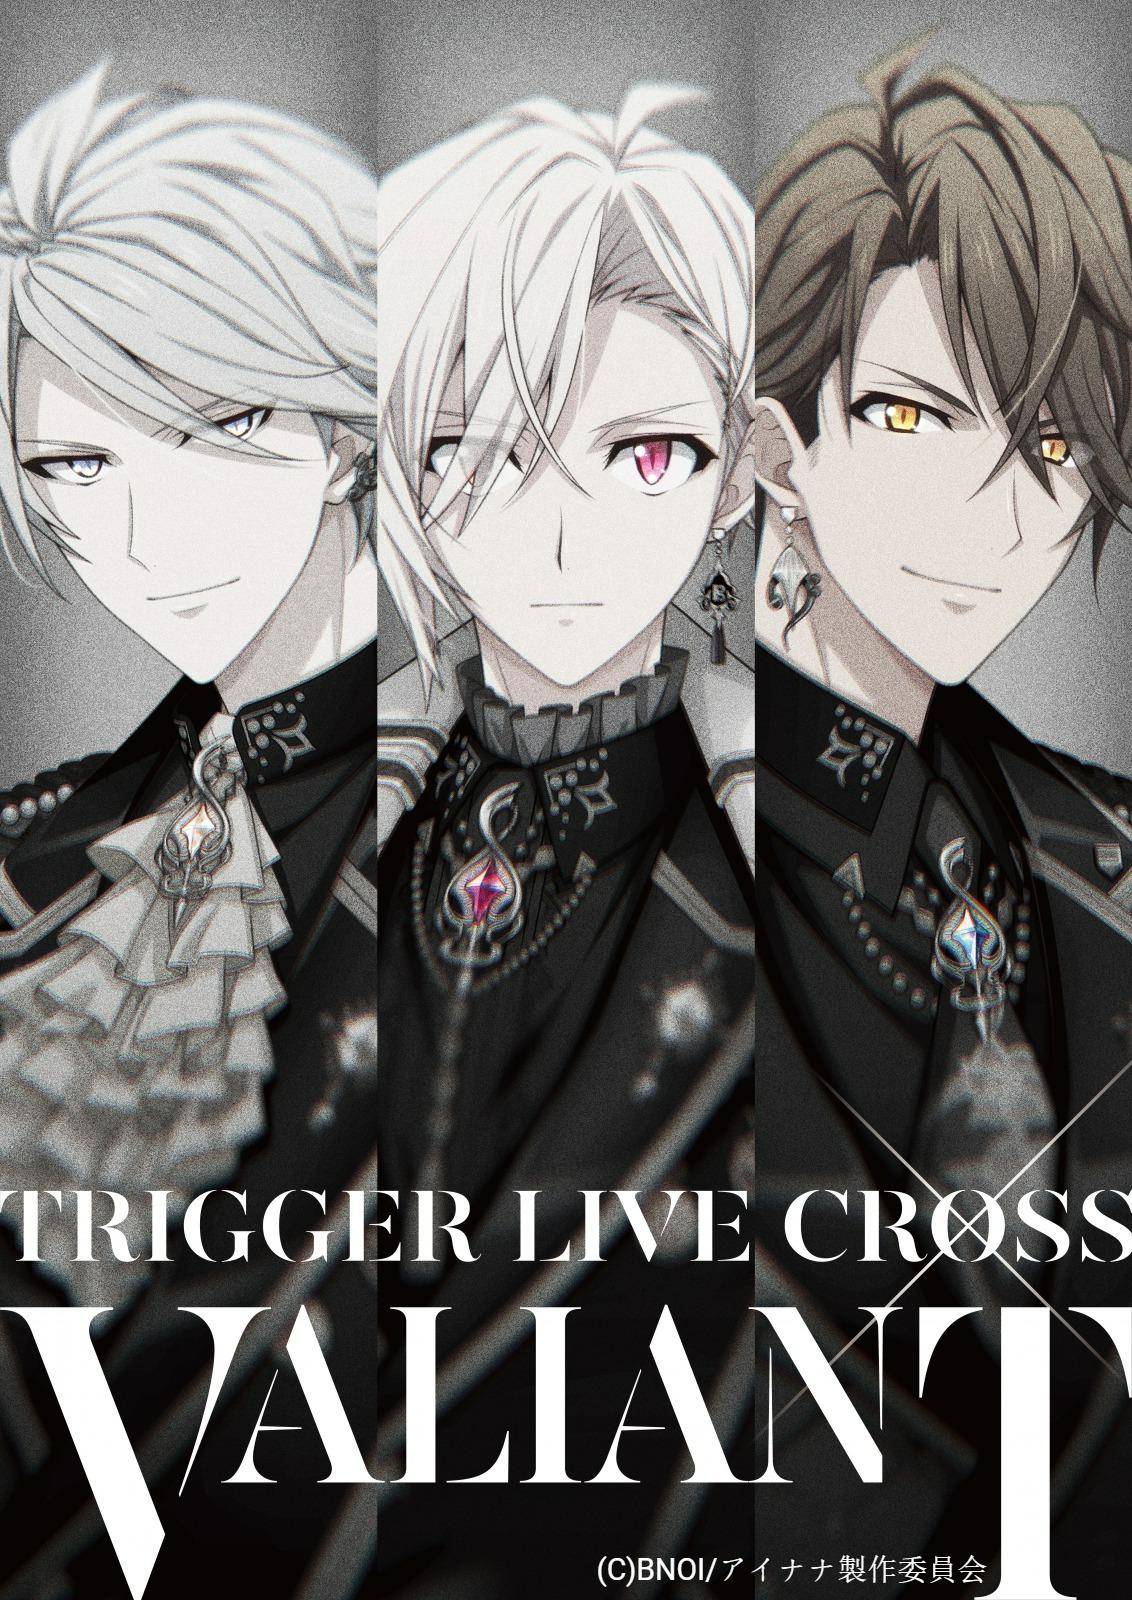 [Streaming+] TRIGGER LIVE CROSS